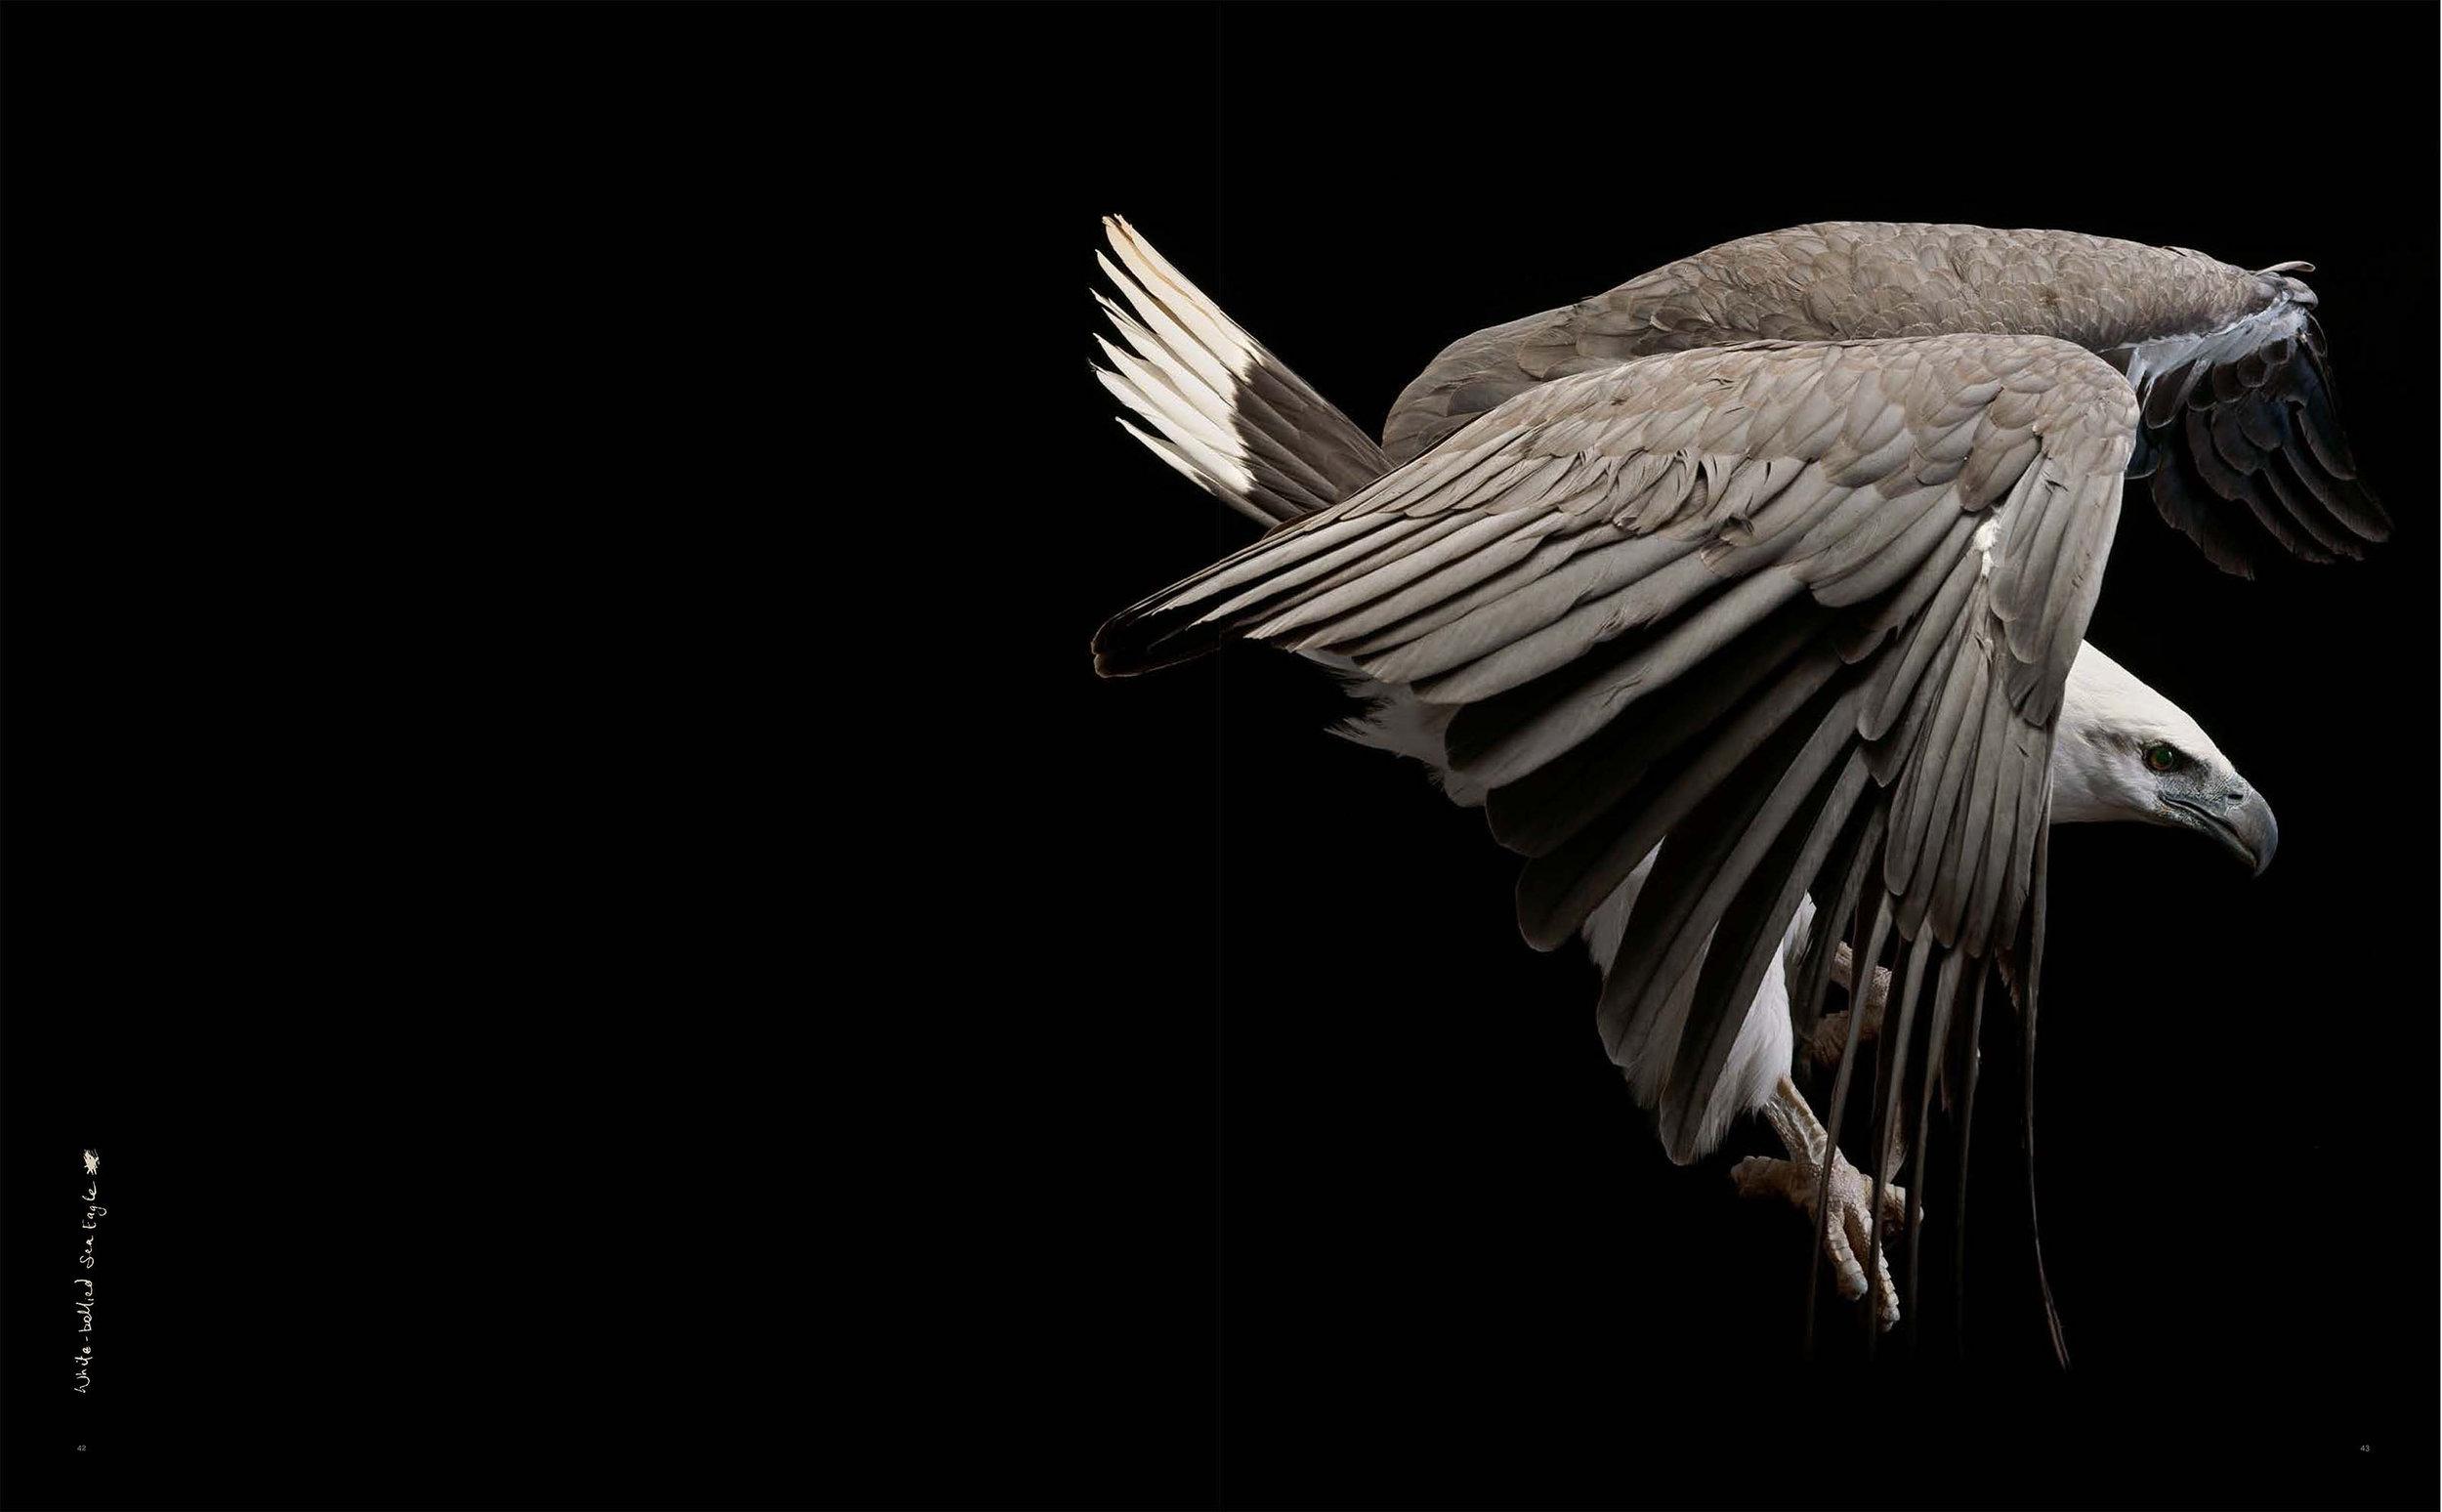 BIRD Gary Heery Book-completemmockup-45 copy.JPG